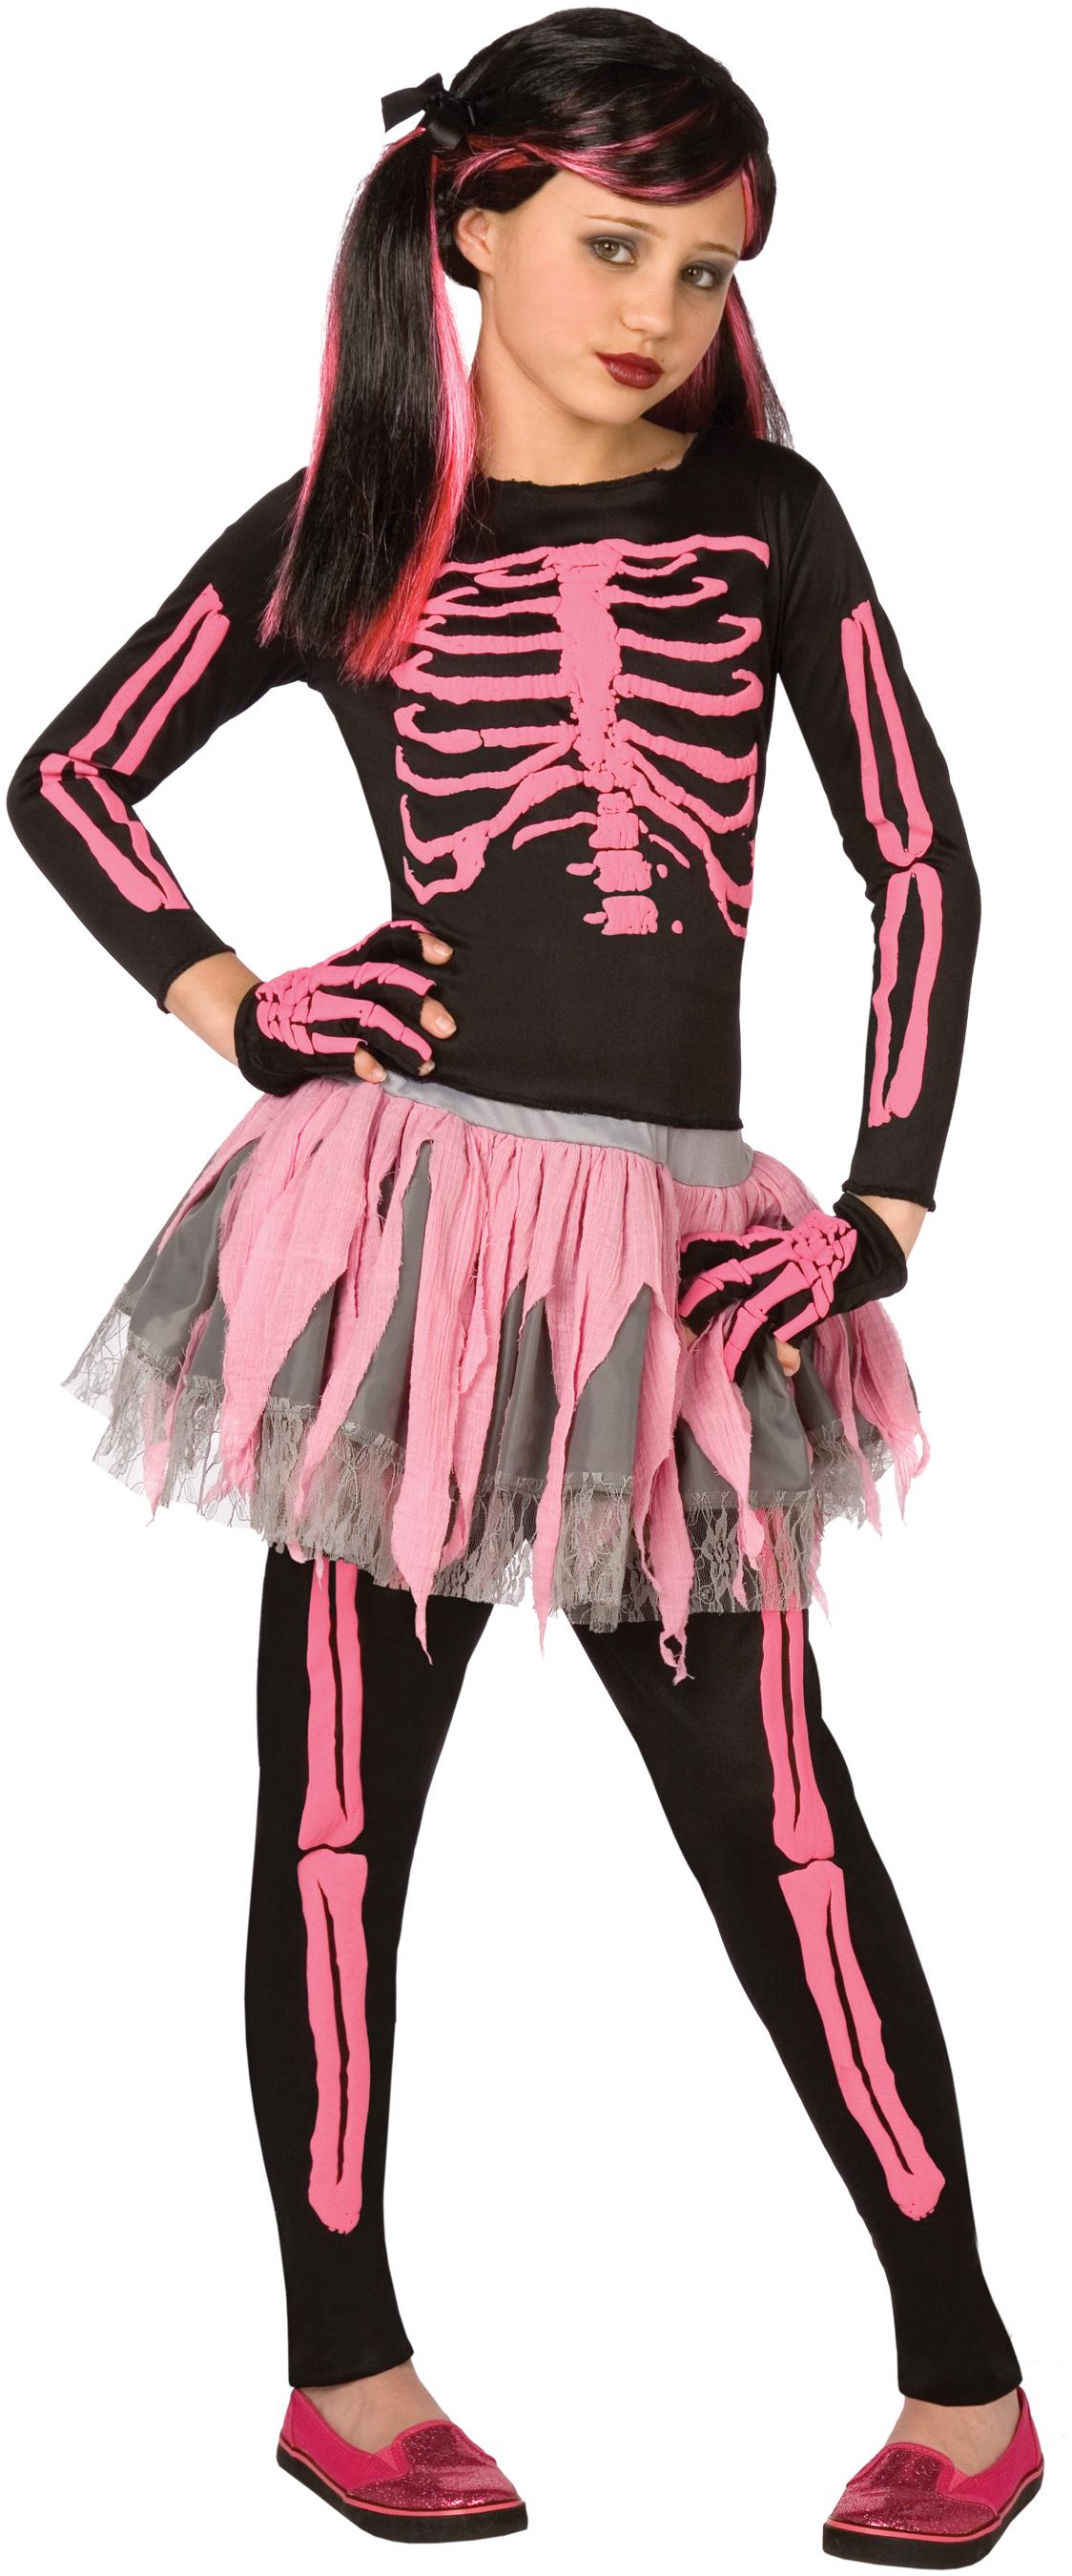 http://www.partybell.com/p-19491-punk-skeleton-child-costume.aspx